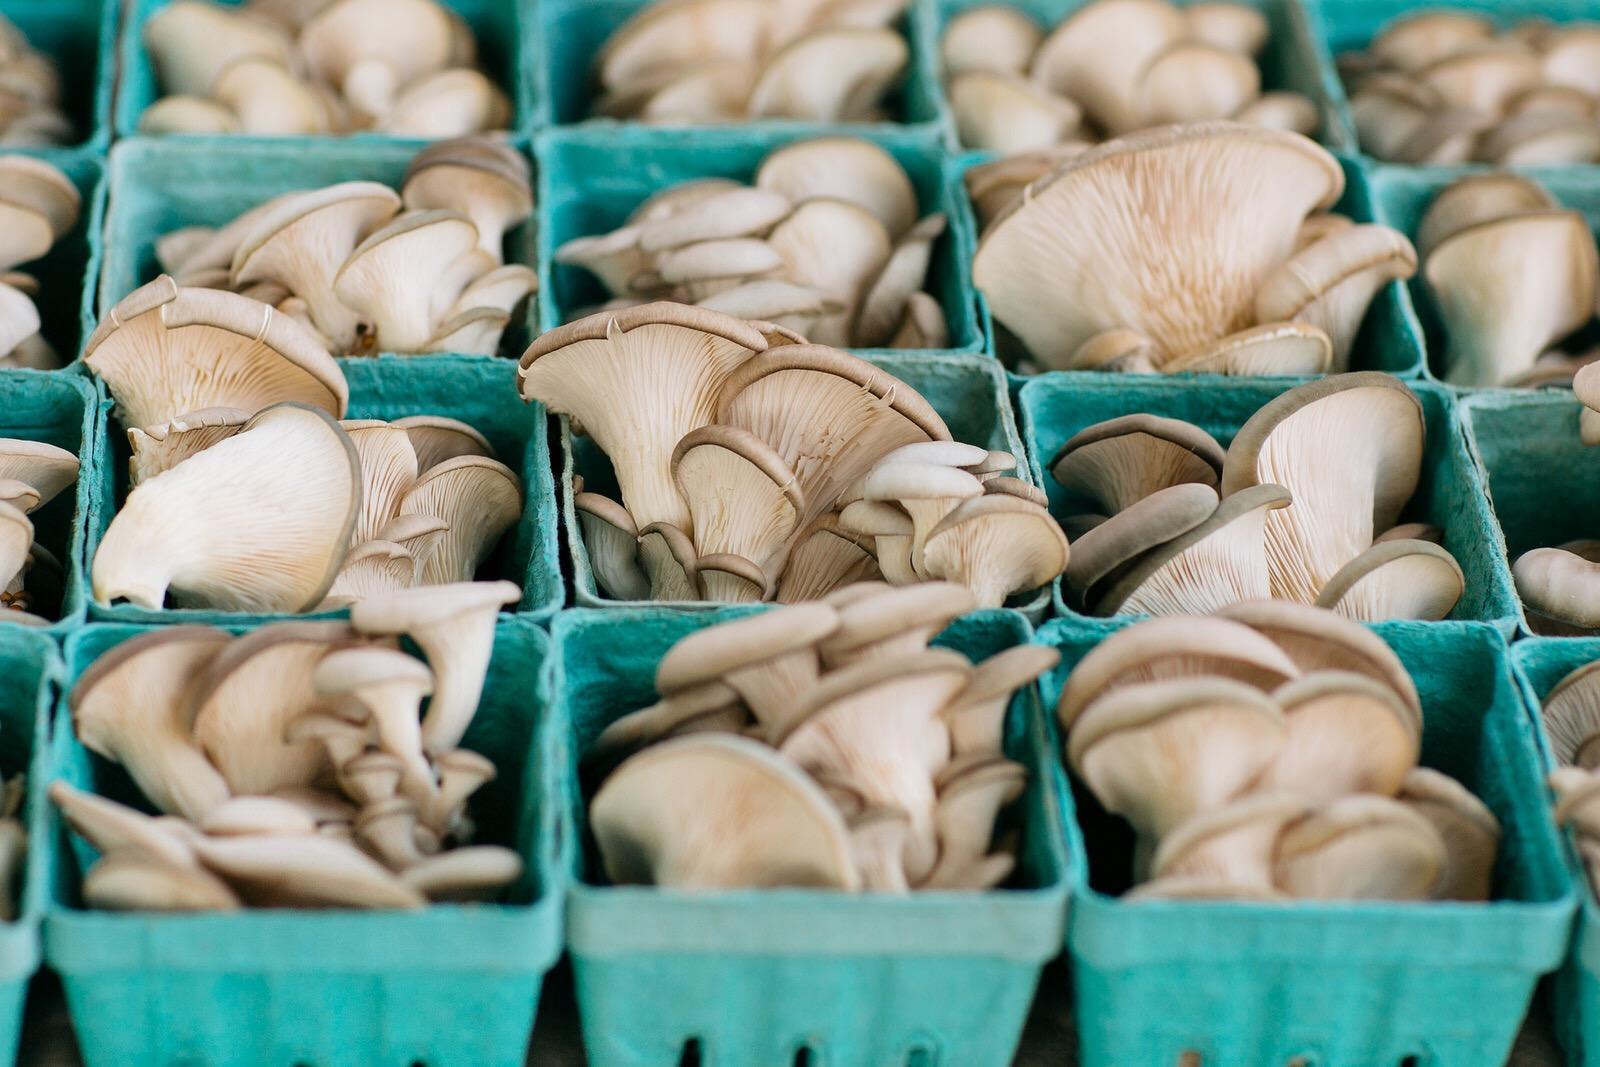 mushroom immune boosters